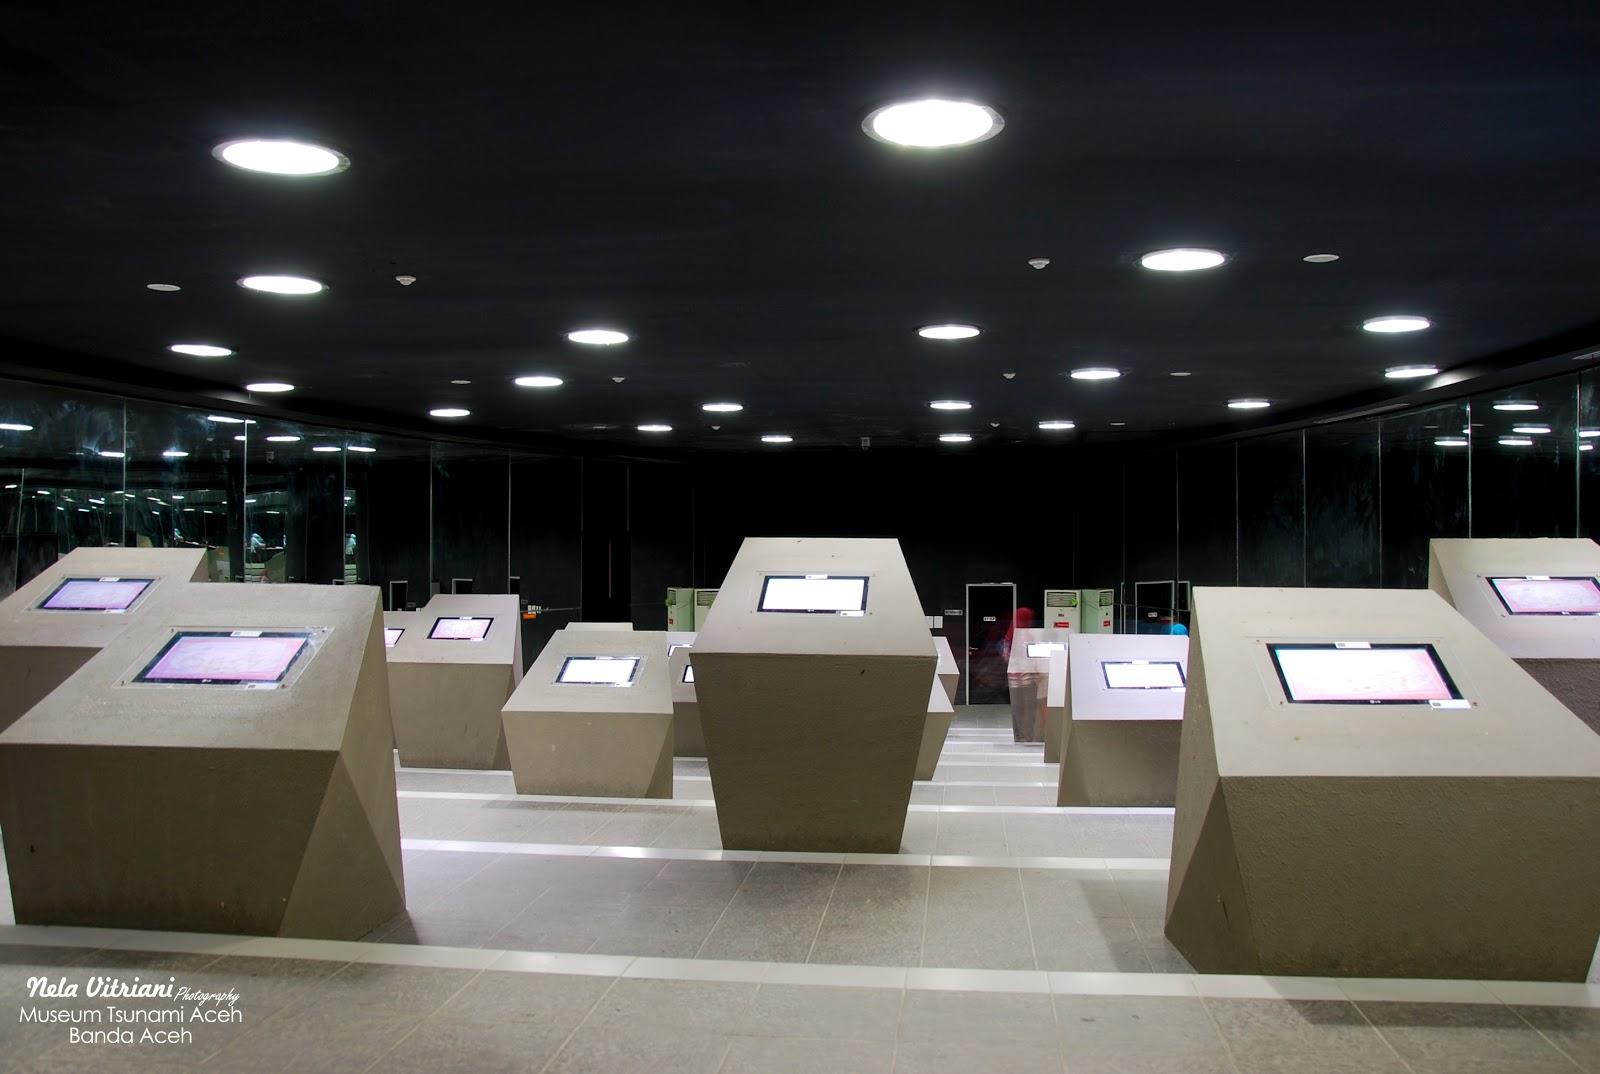 Tsunami Museum Banda Aceh Naggroe Darussalam Located Symbolize Epic Tragedy